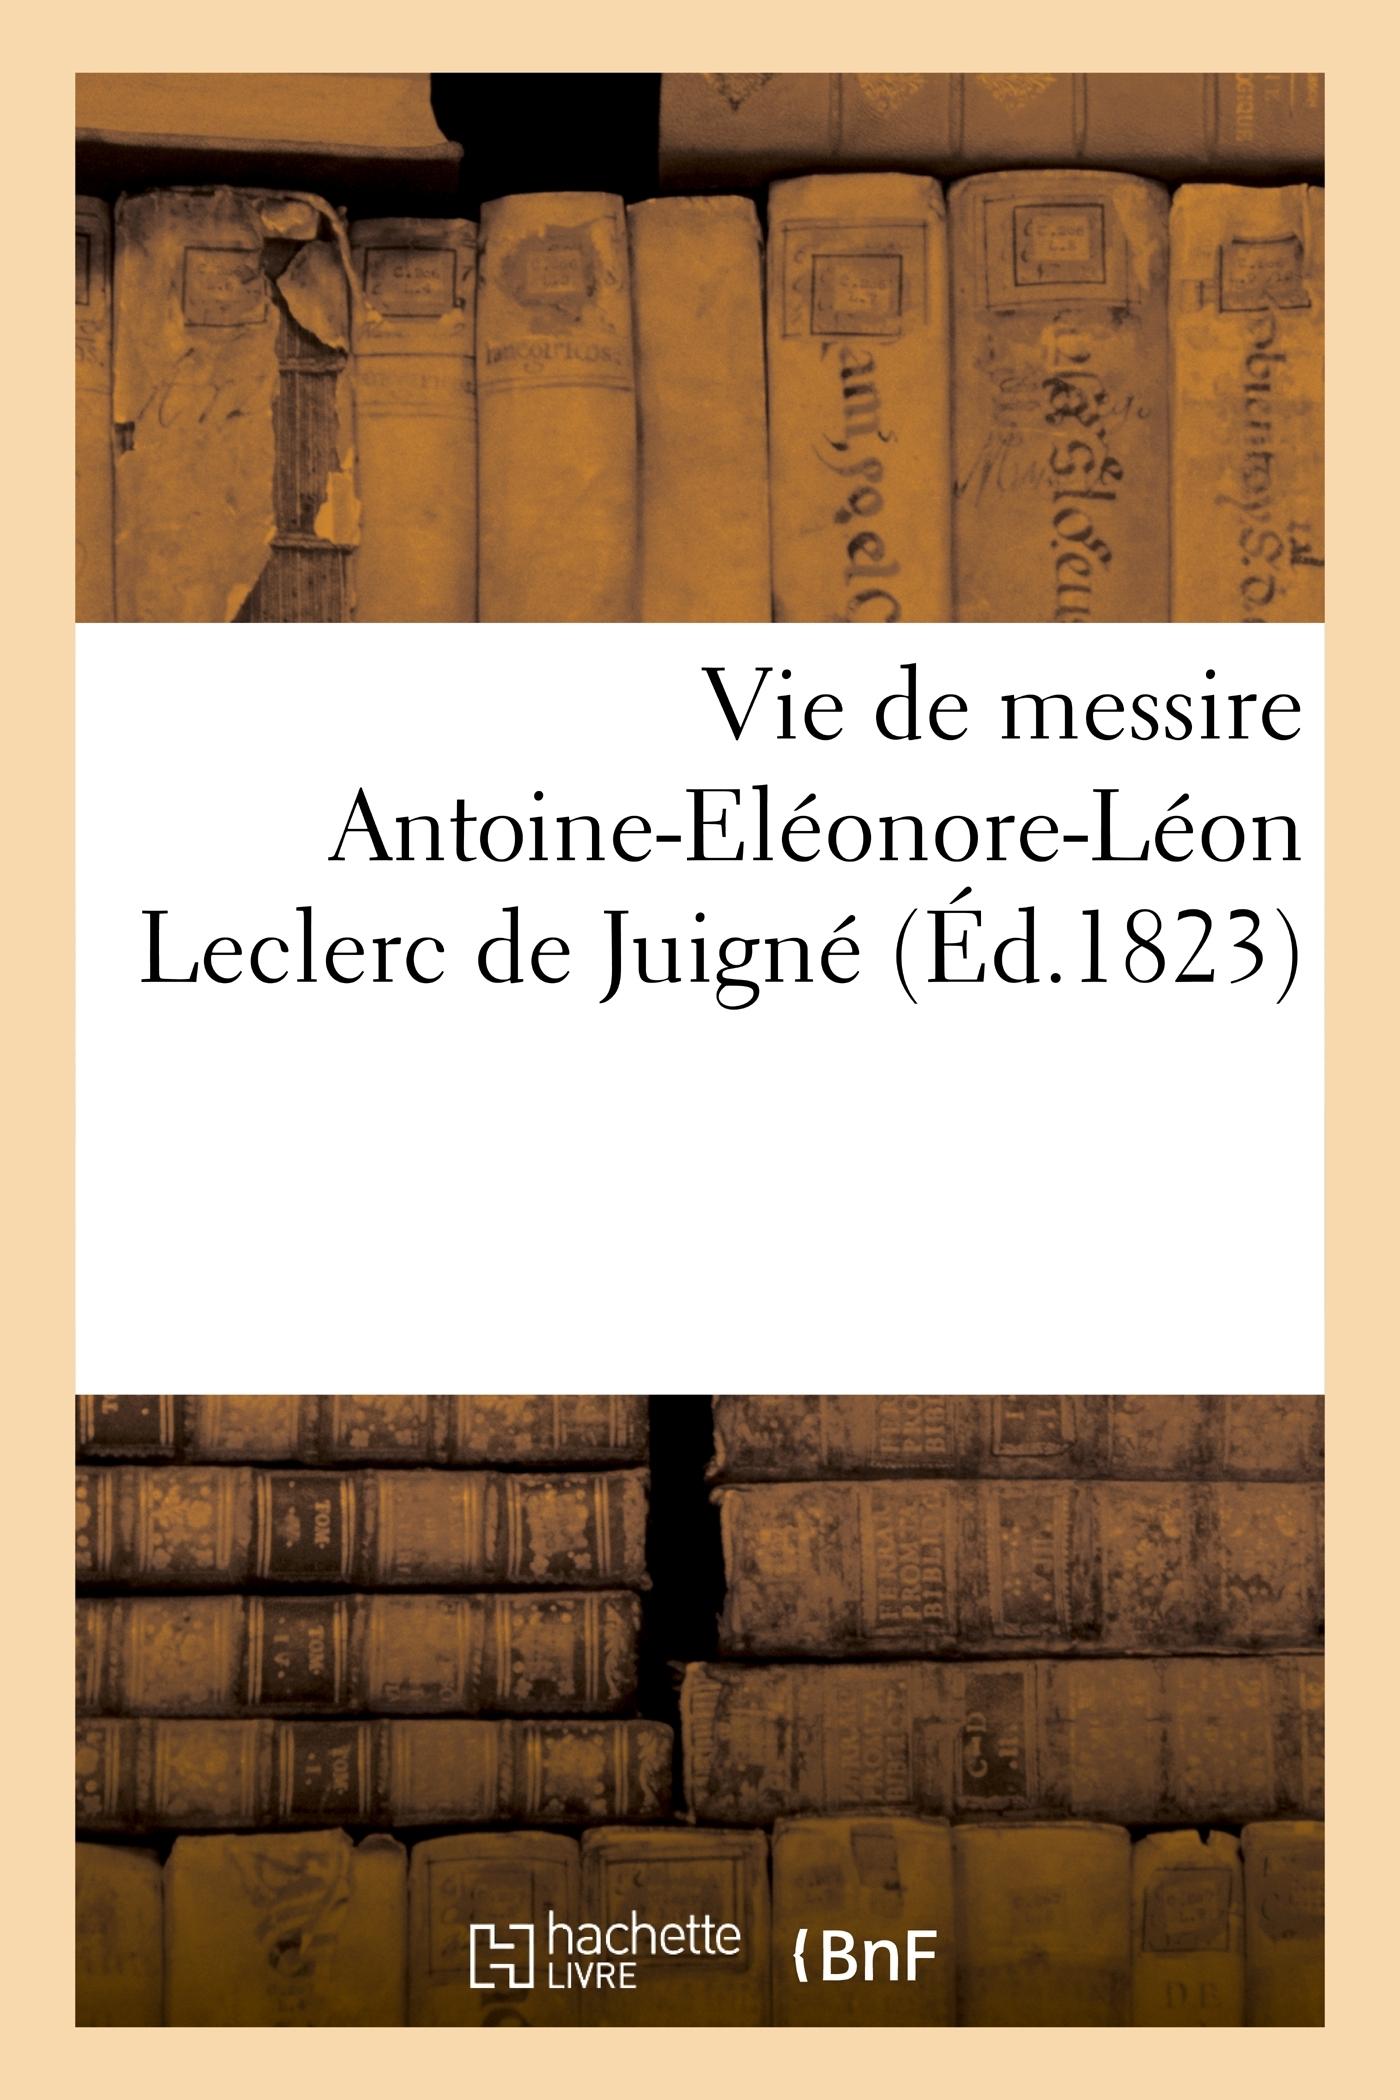 VIE DE MESSIRE ANTOINE-ELEONOR-LEON LECLERC DE JUIGNE